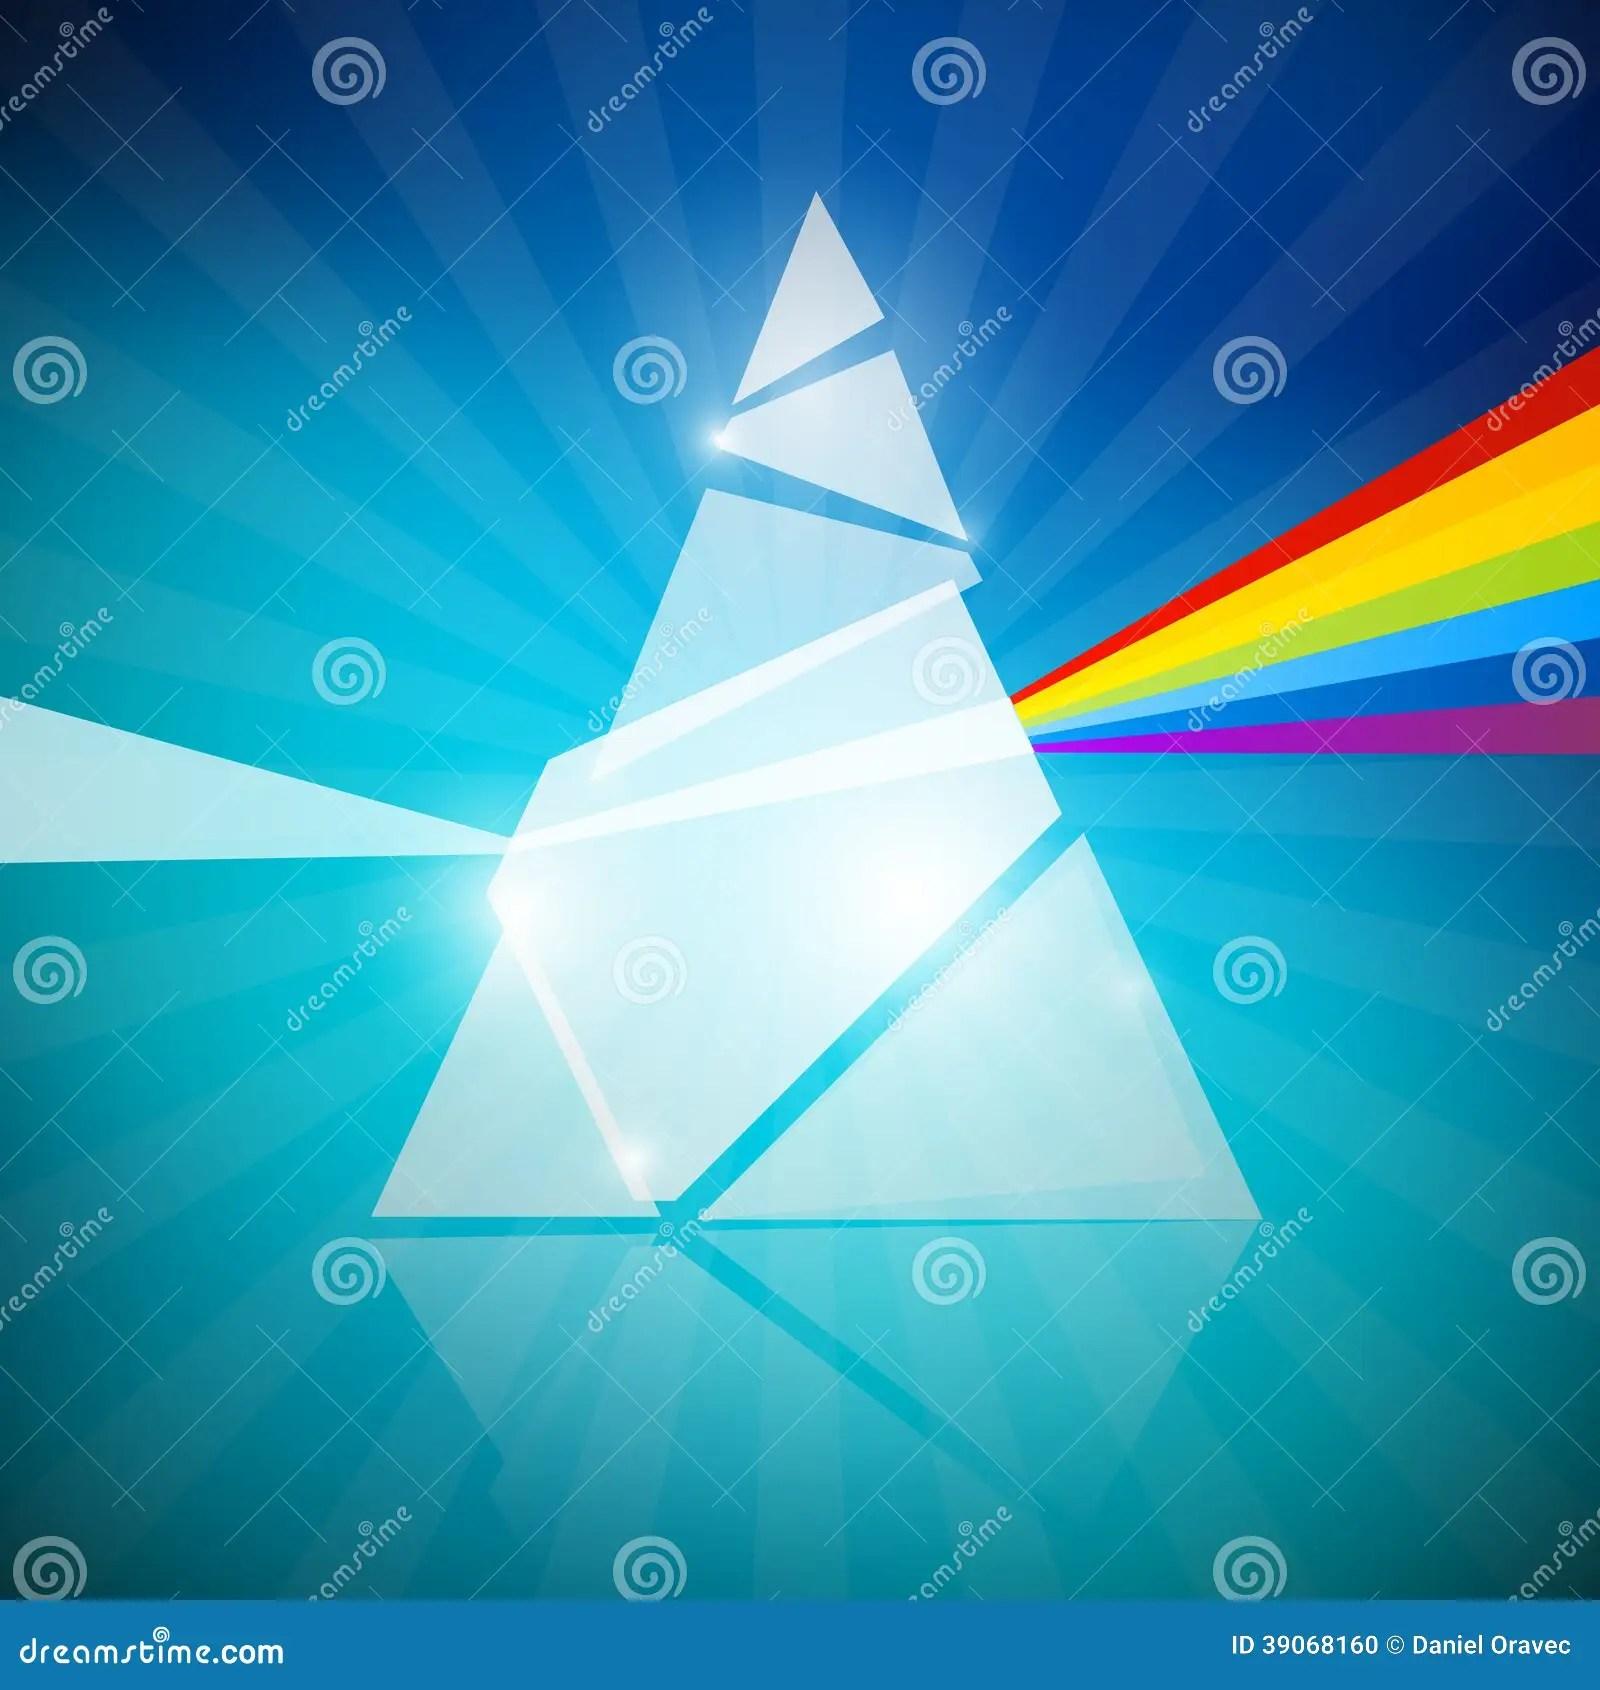 Prism Spectrum Illustration Stock Vector